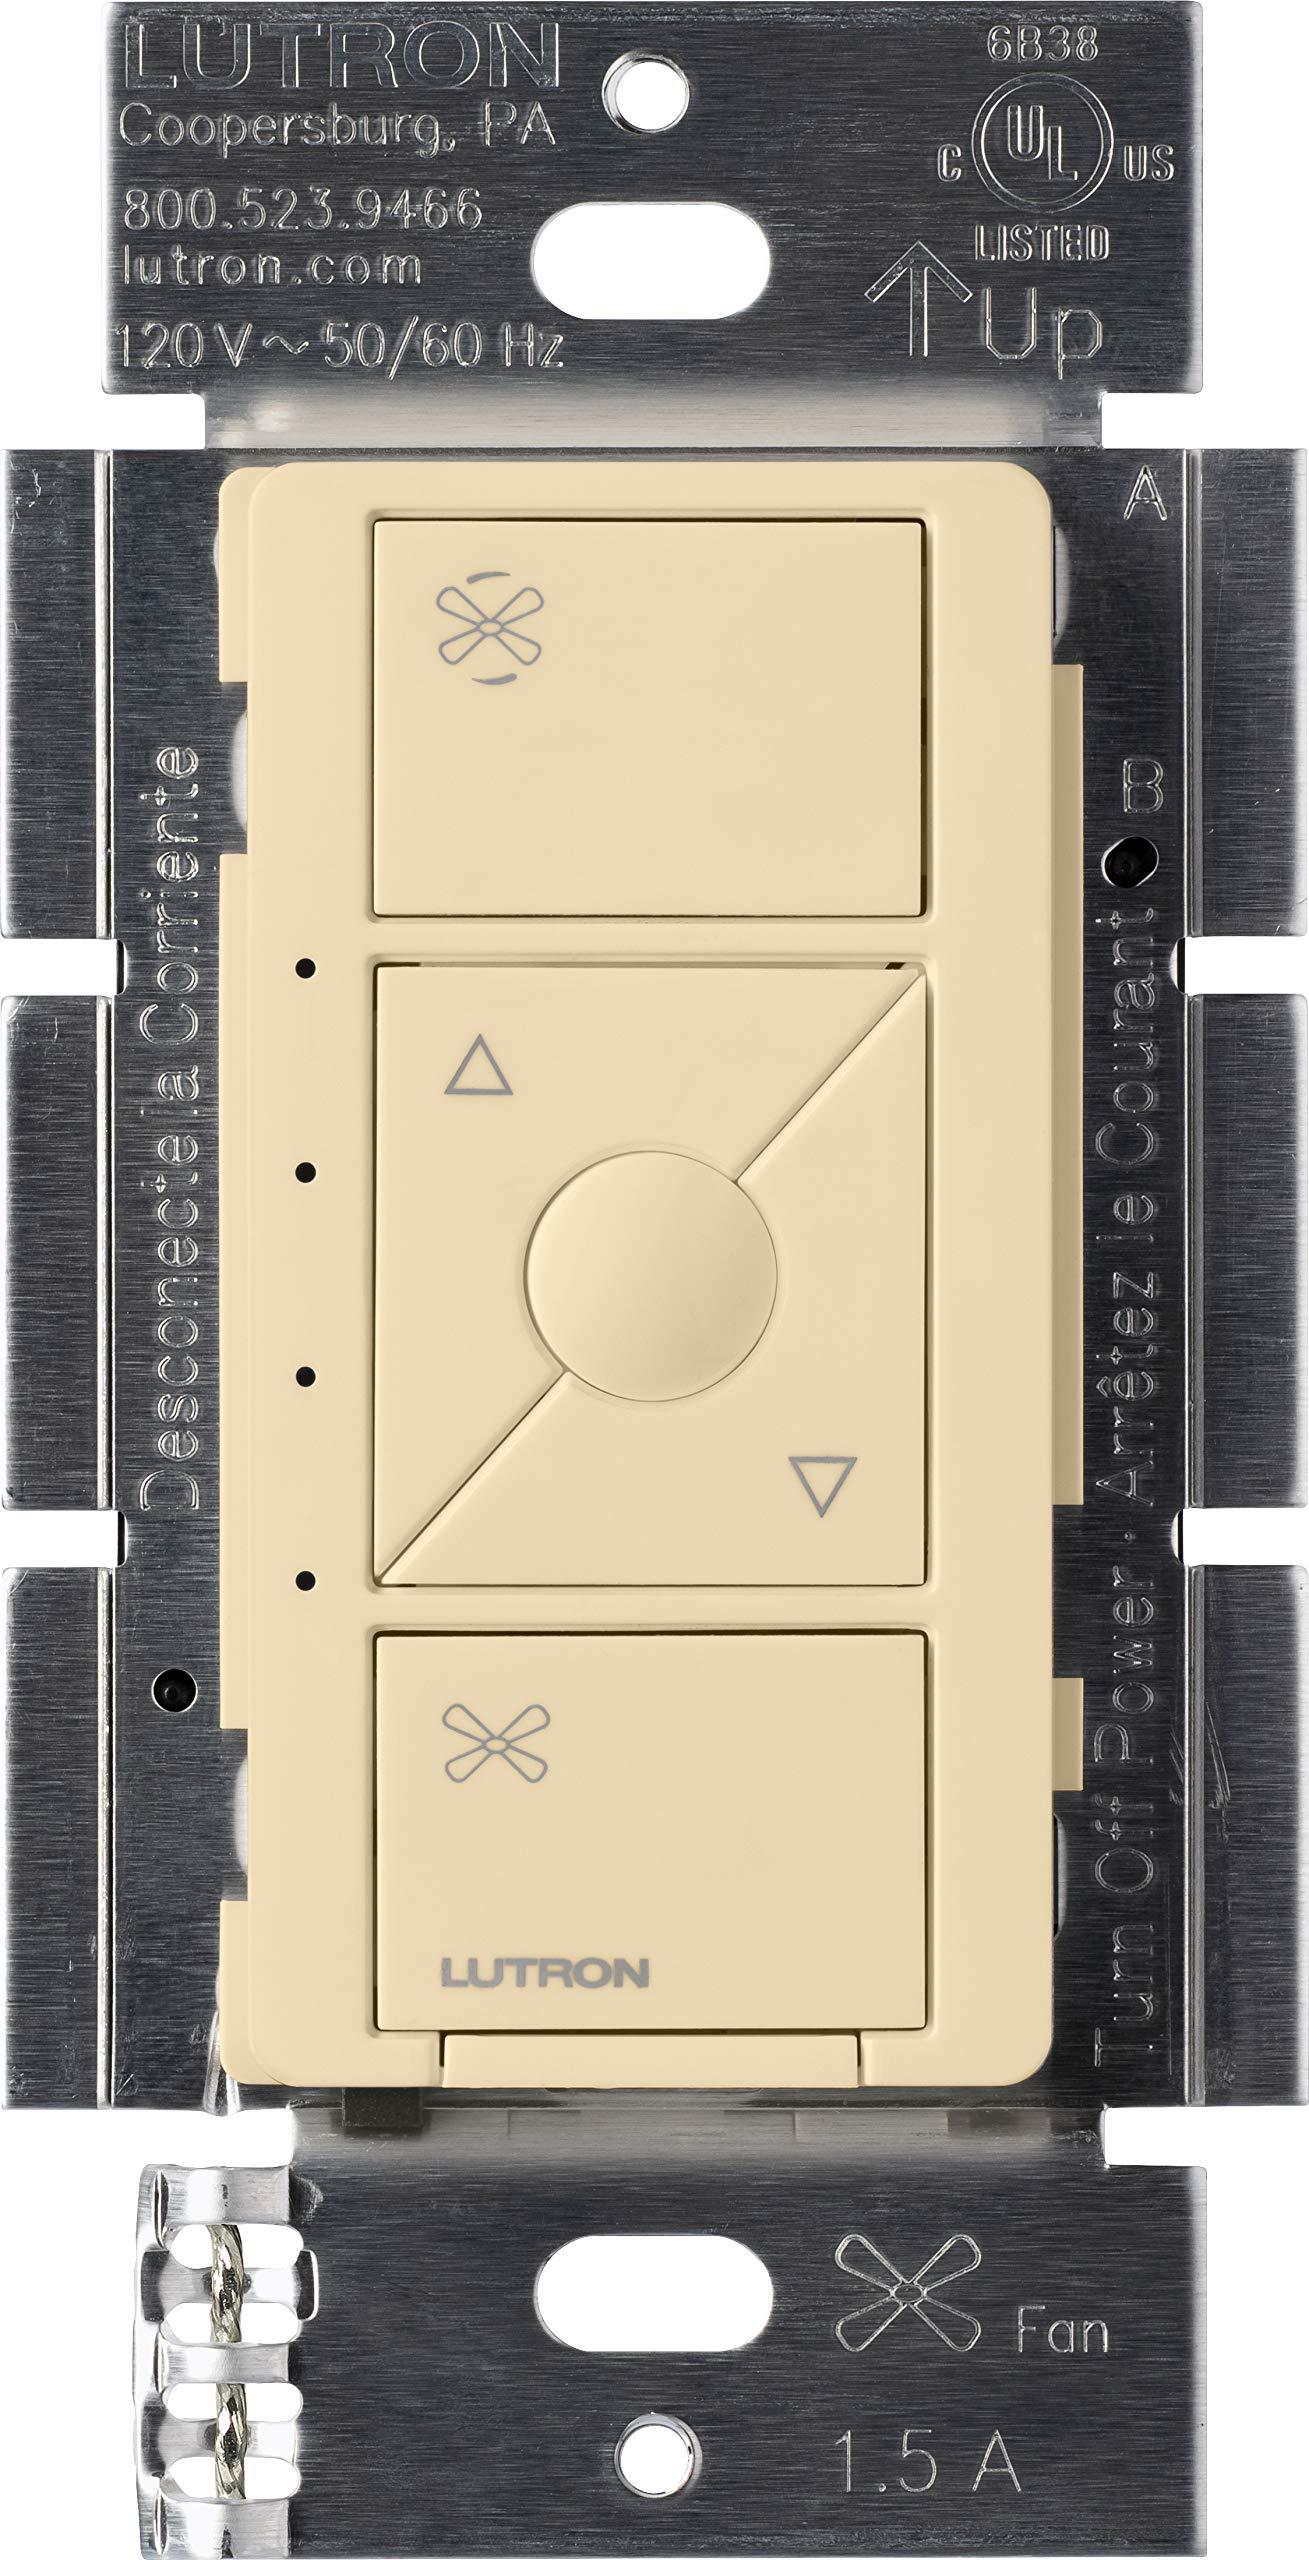 Lutron Caseta Wireless Smart Fan Speed Control, Single-Pole, PD-FSQN-IV, Ivory, Works with Alexa, Apple HomeKit, and the Google Assistant